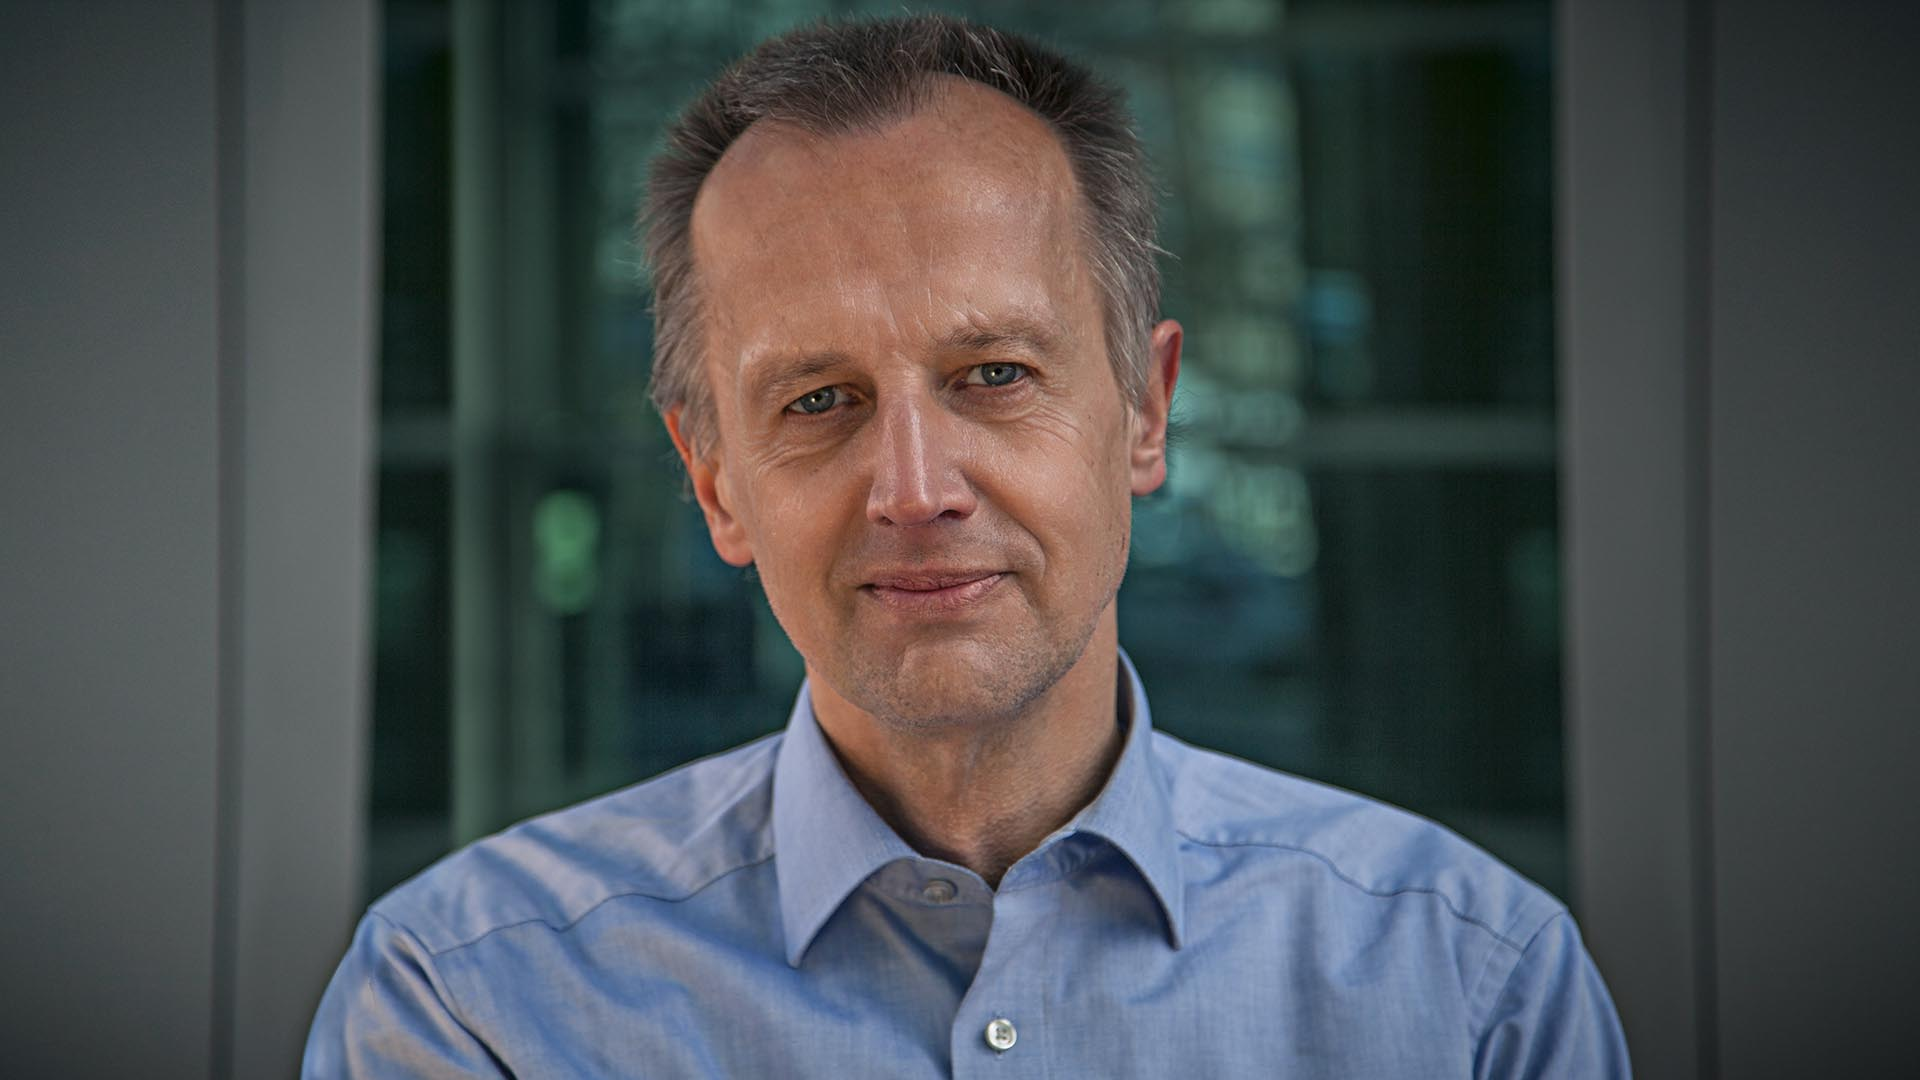 Volker Stern